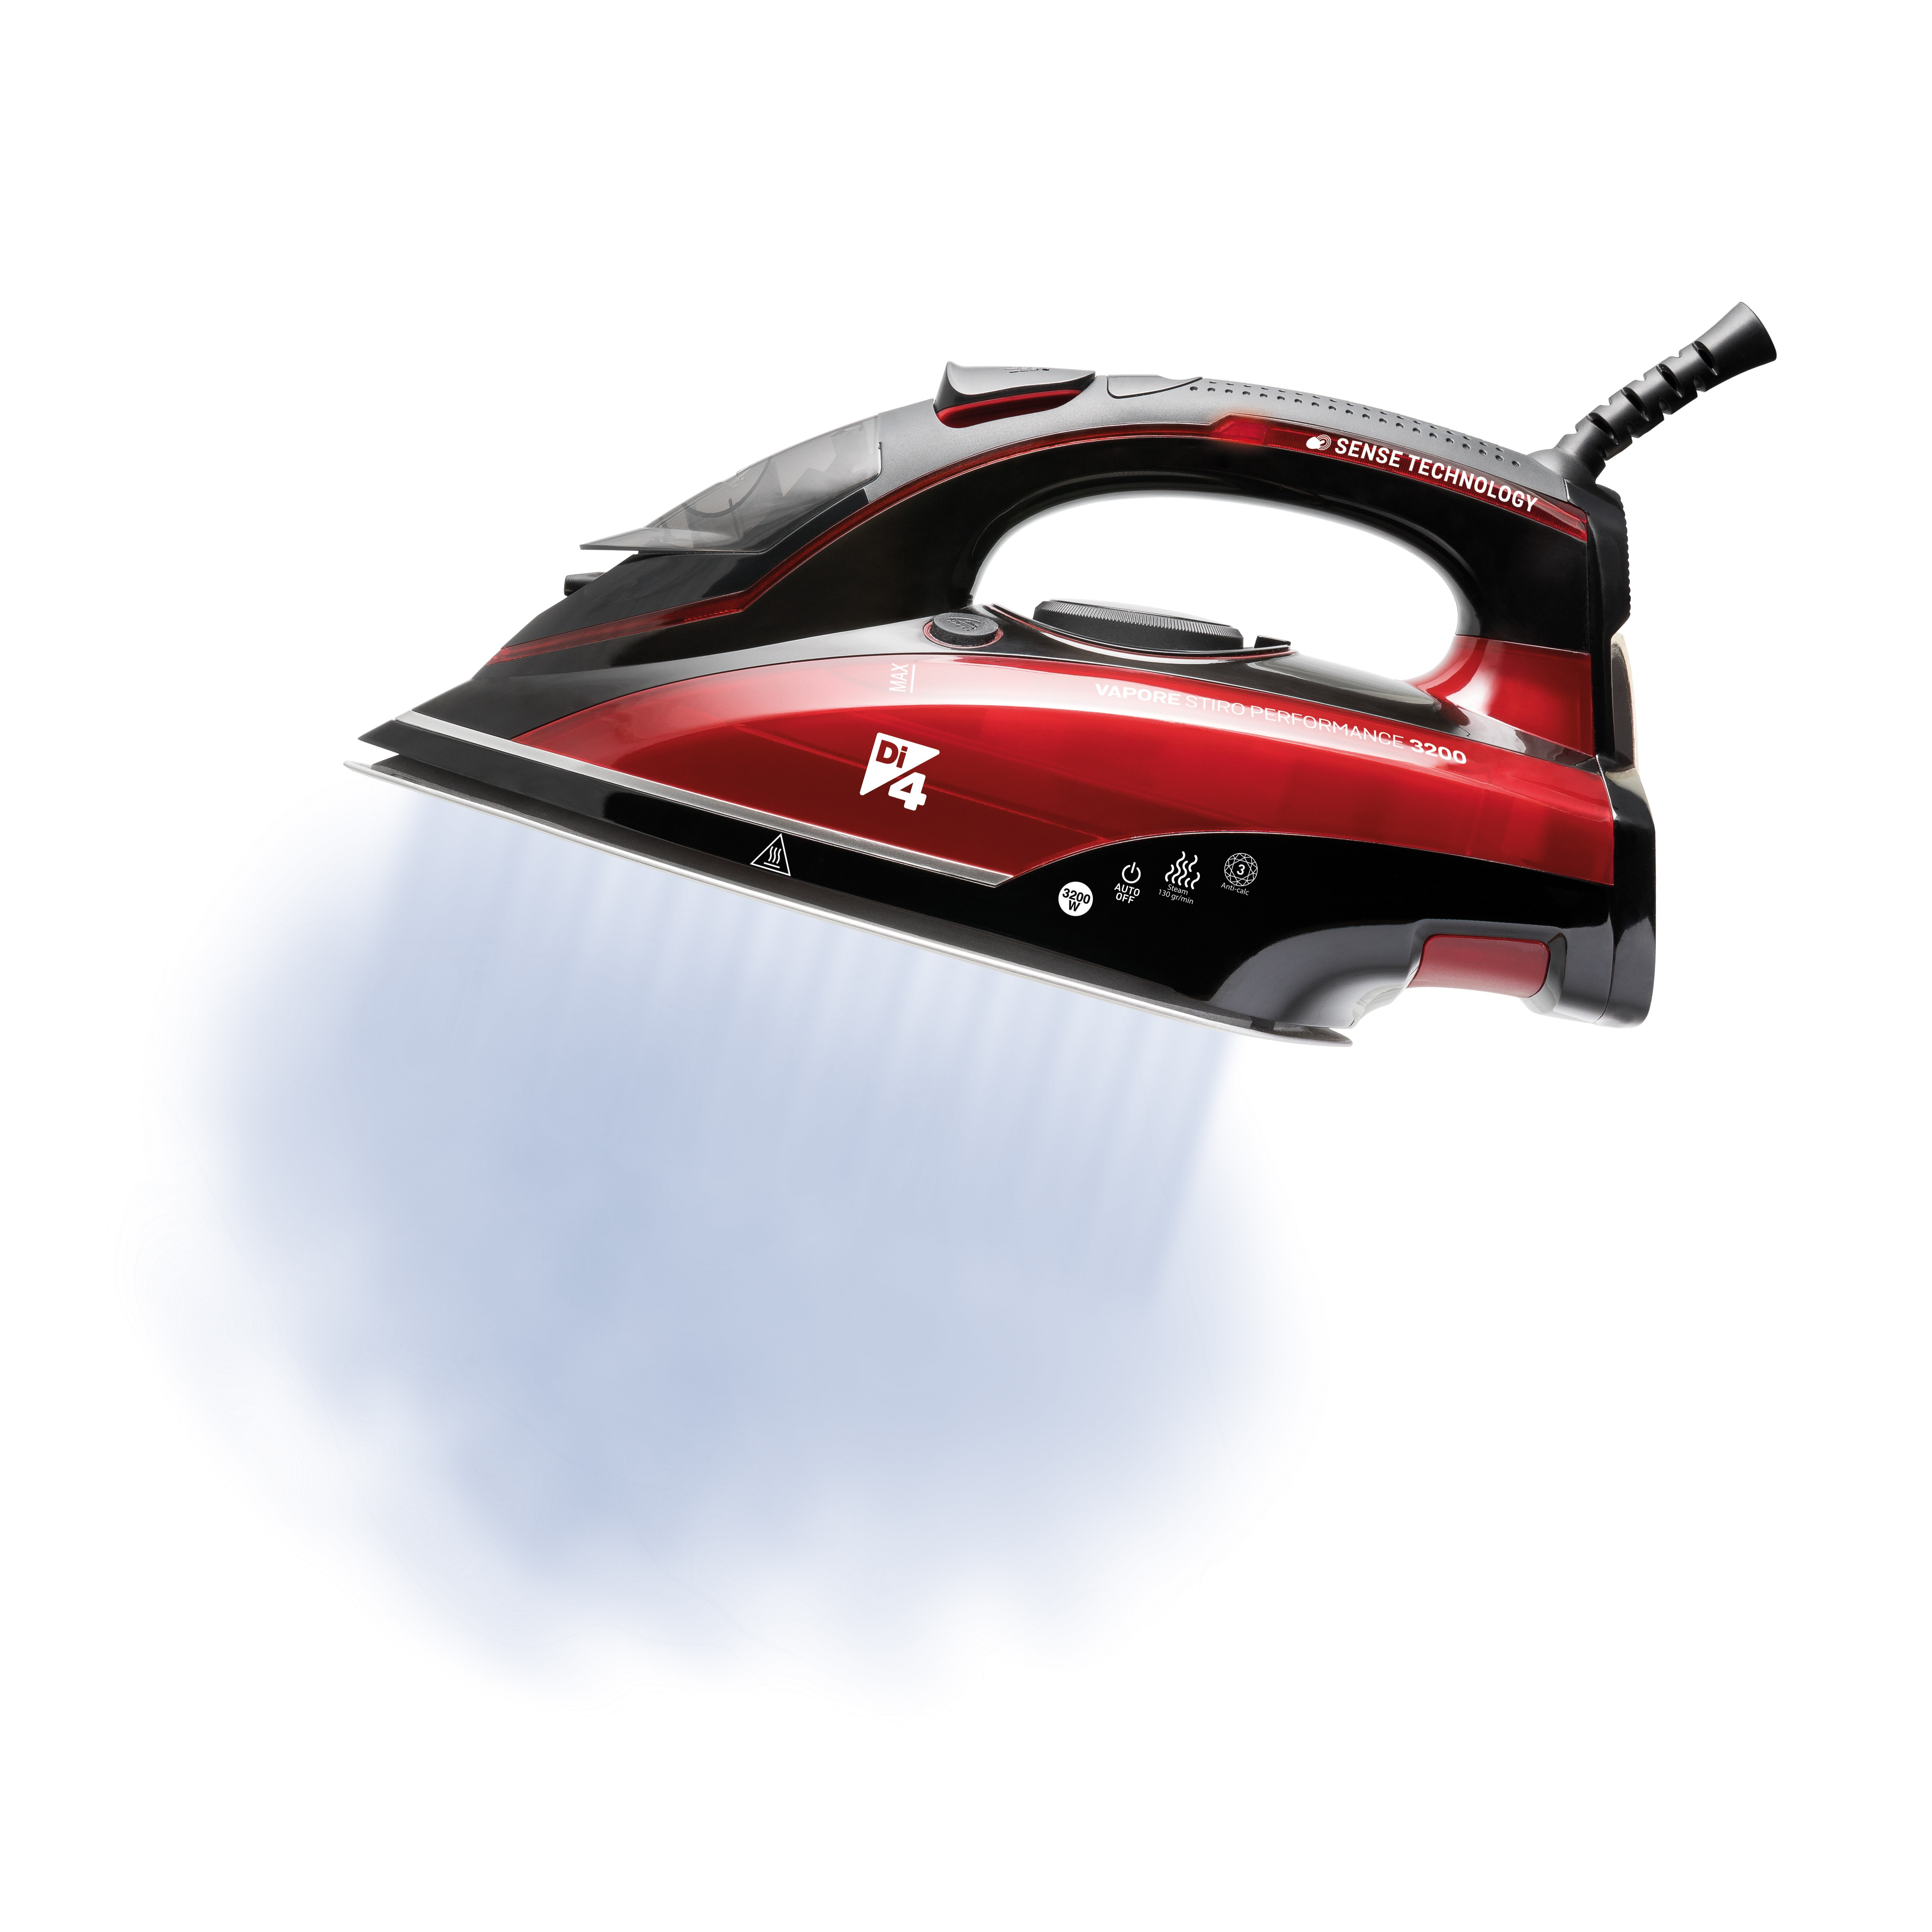 plancha di4 vapore stiro performance 3200